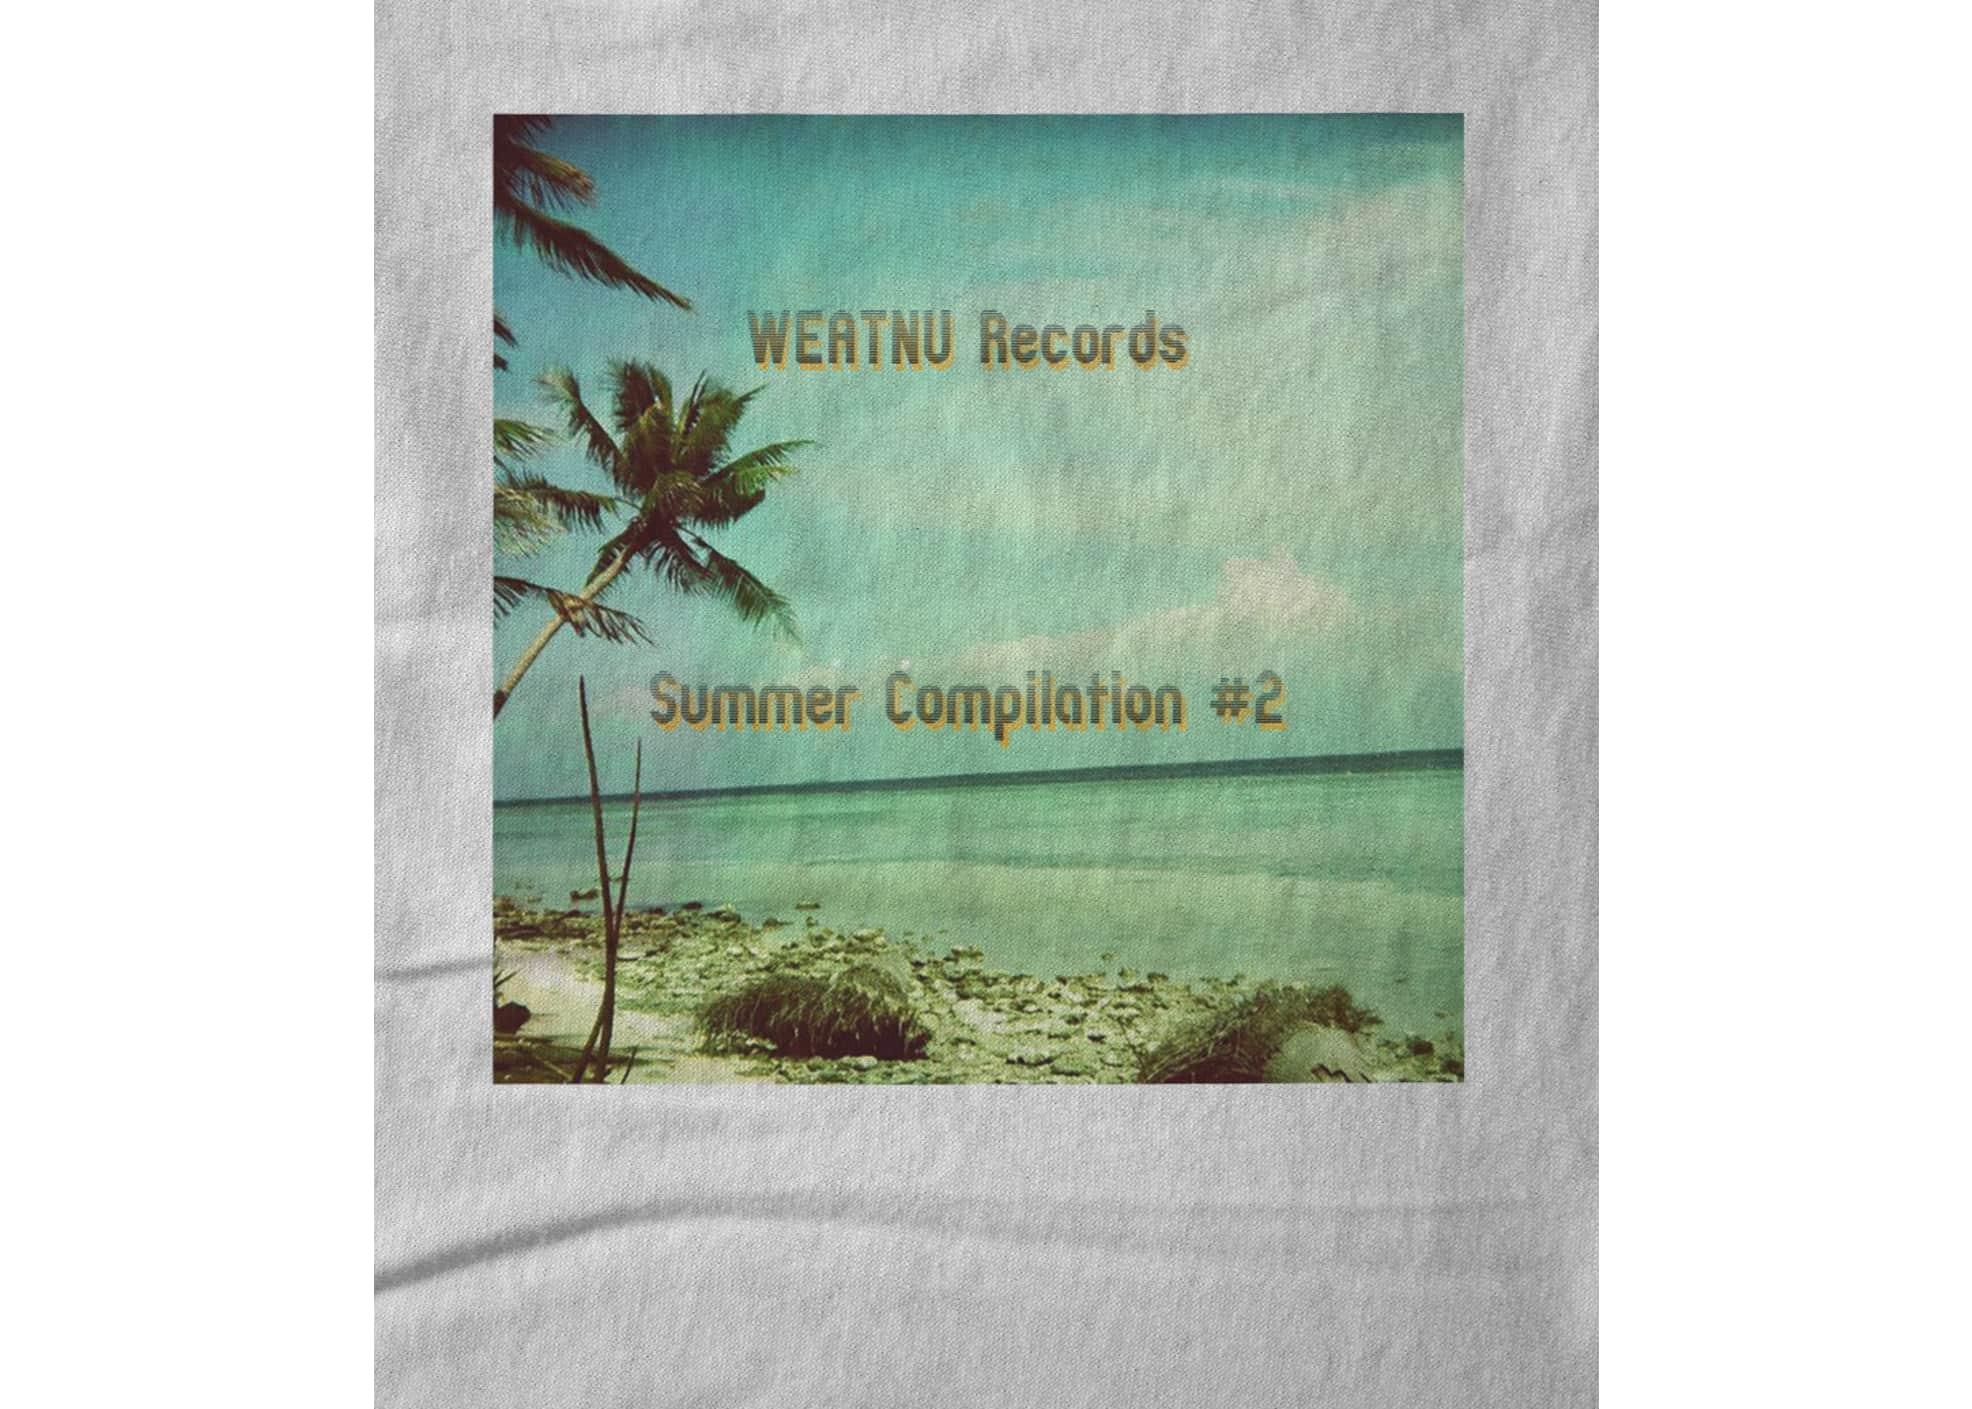 Weatnu records weatnu records  summer compilation  2  1529517906